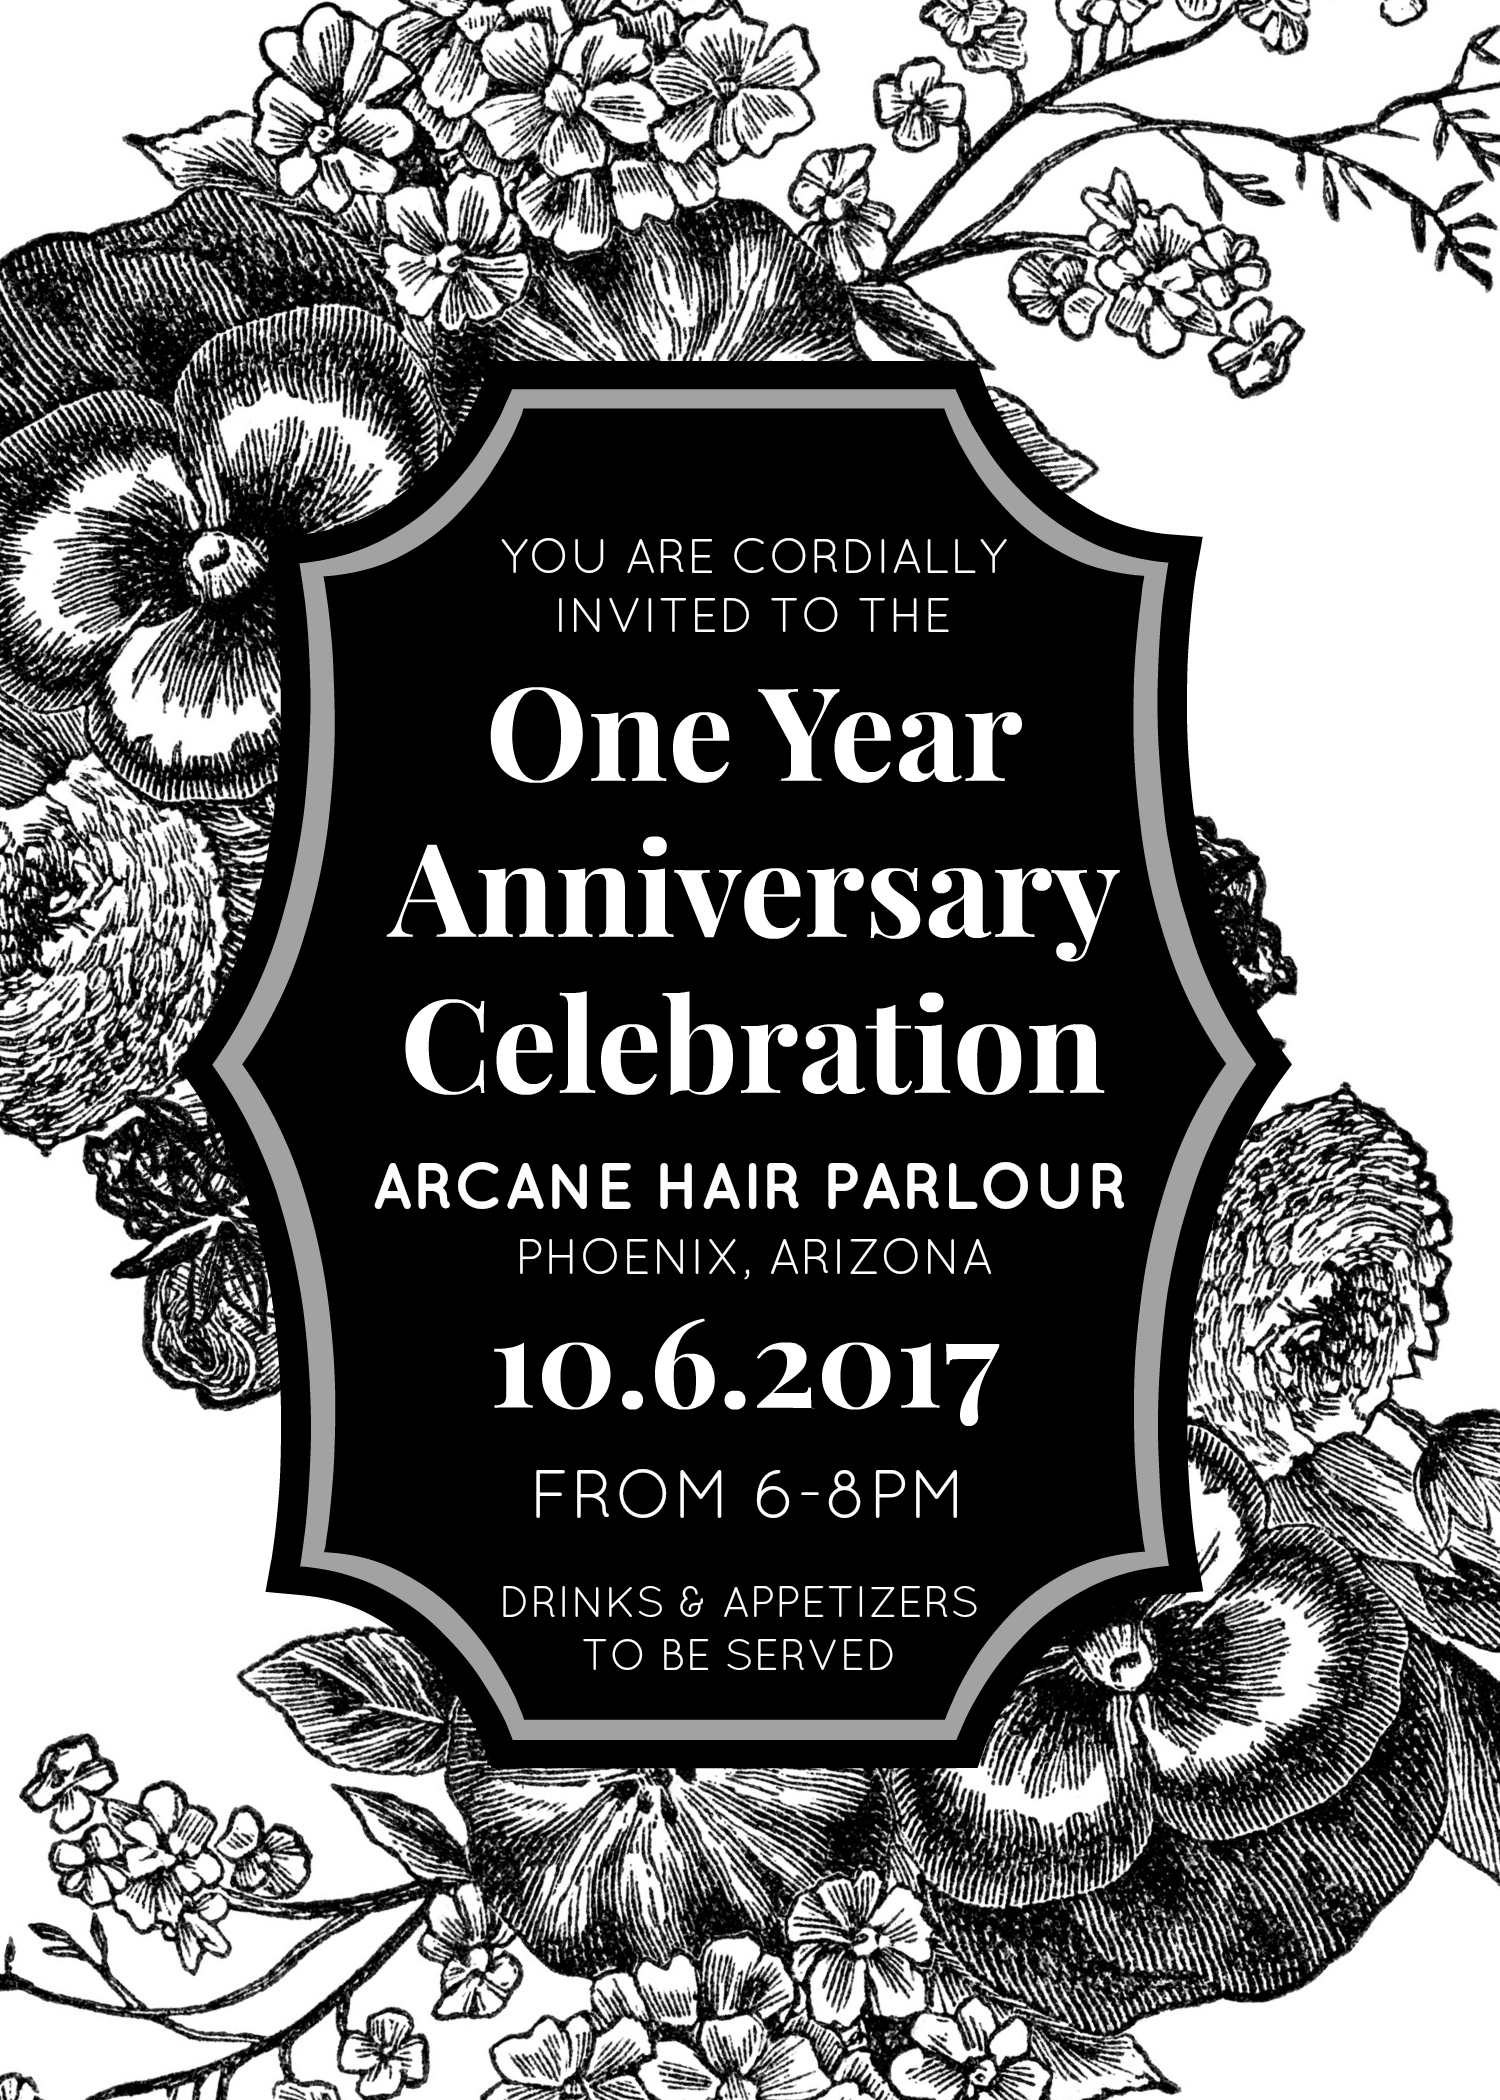 one year anniversary arcane hair parlour downtown phoenix